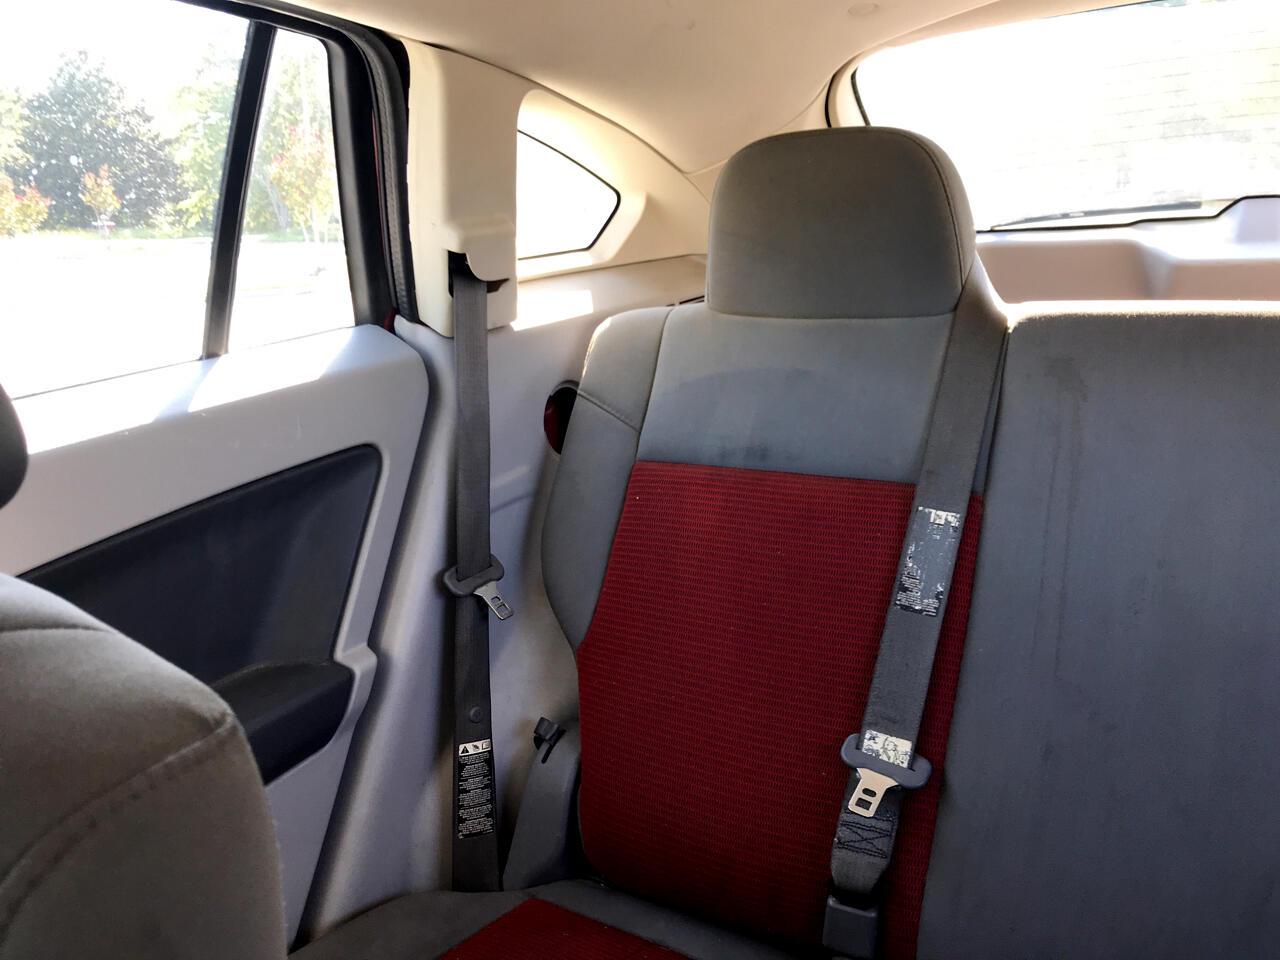 2007 Dodge Caliber 4dr HB R/T AWD